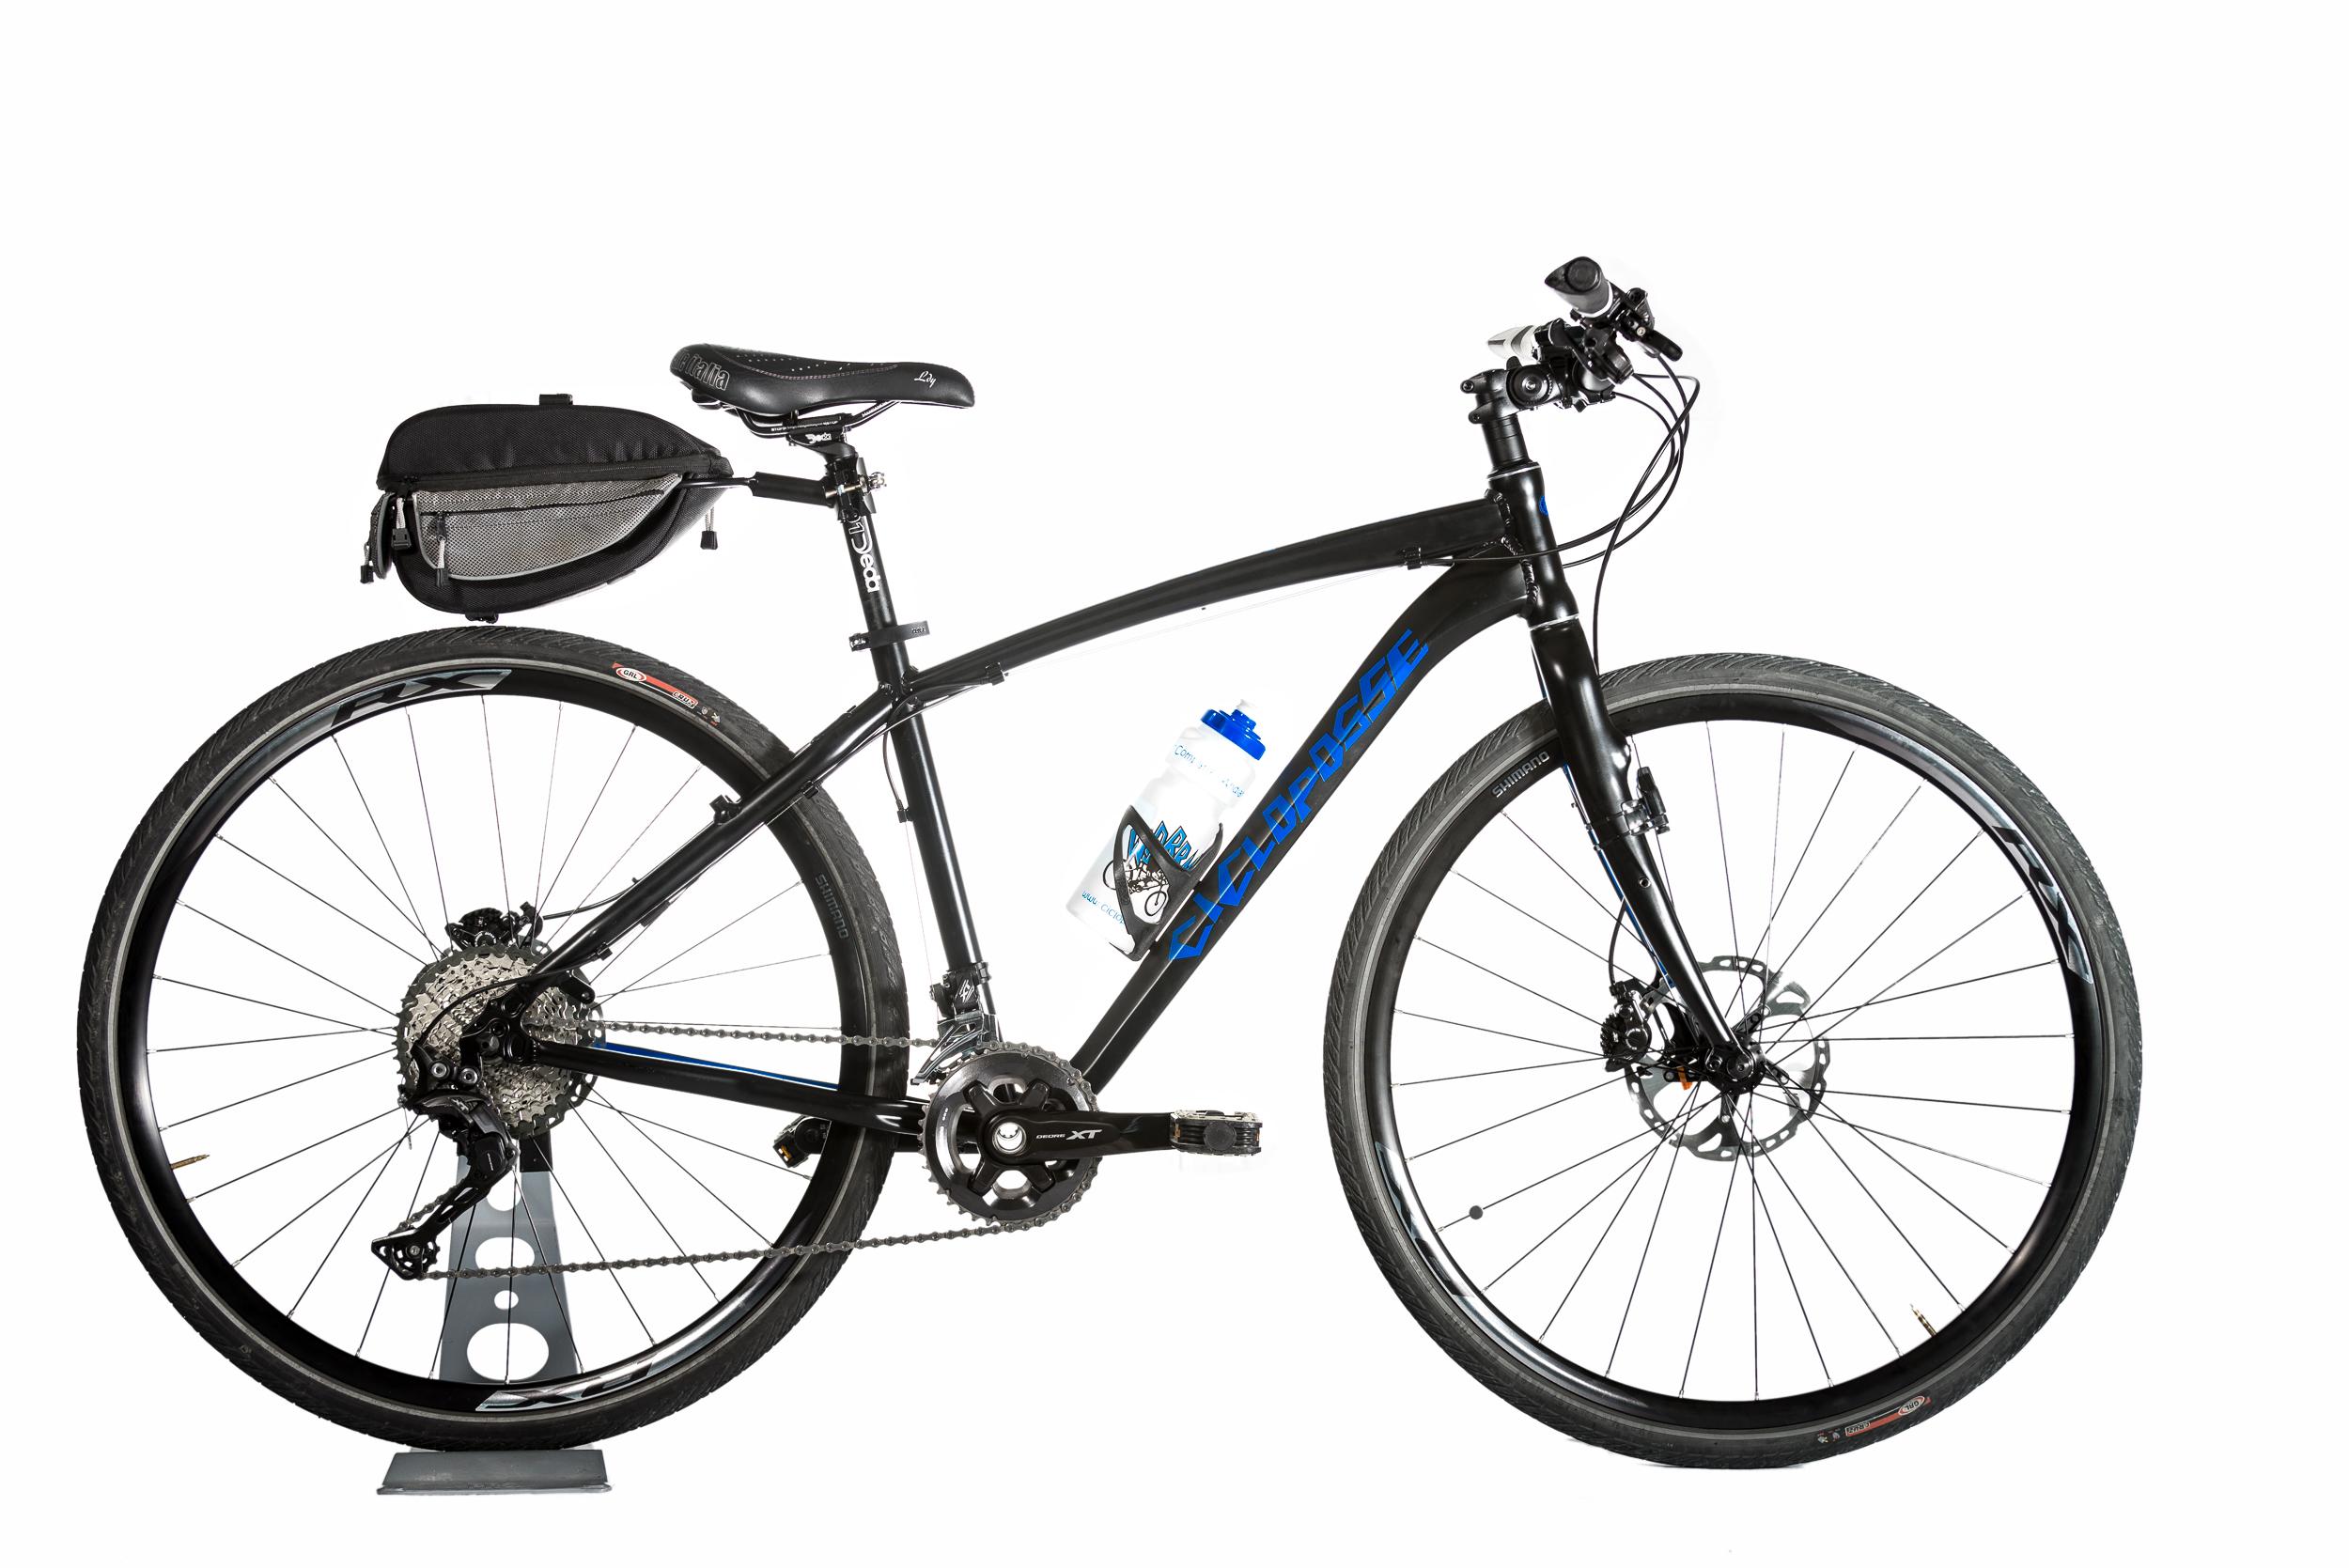 bici ibrida noleggio toscana